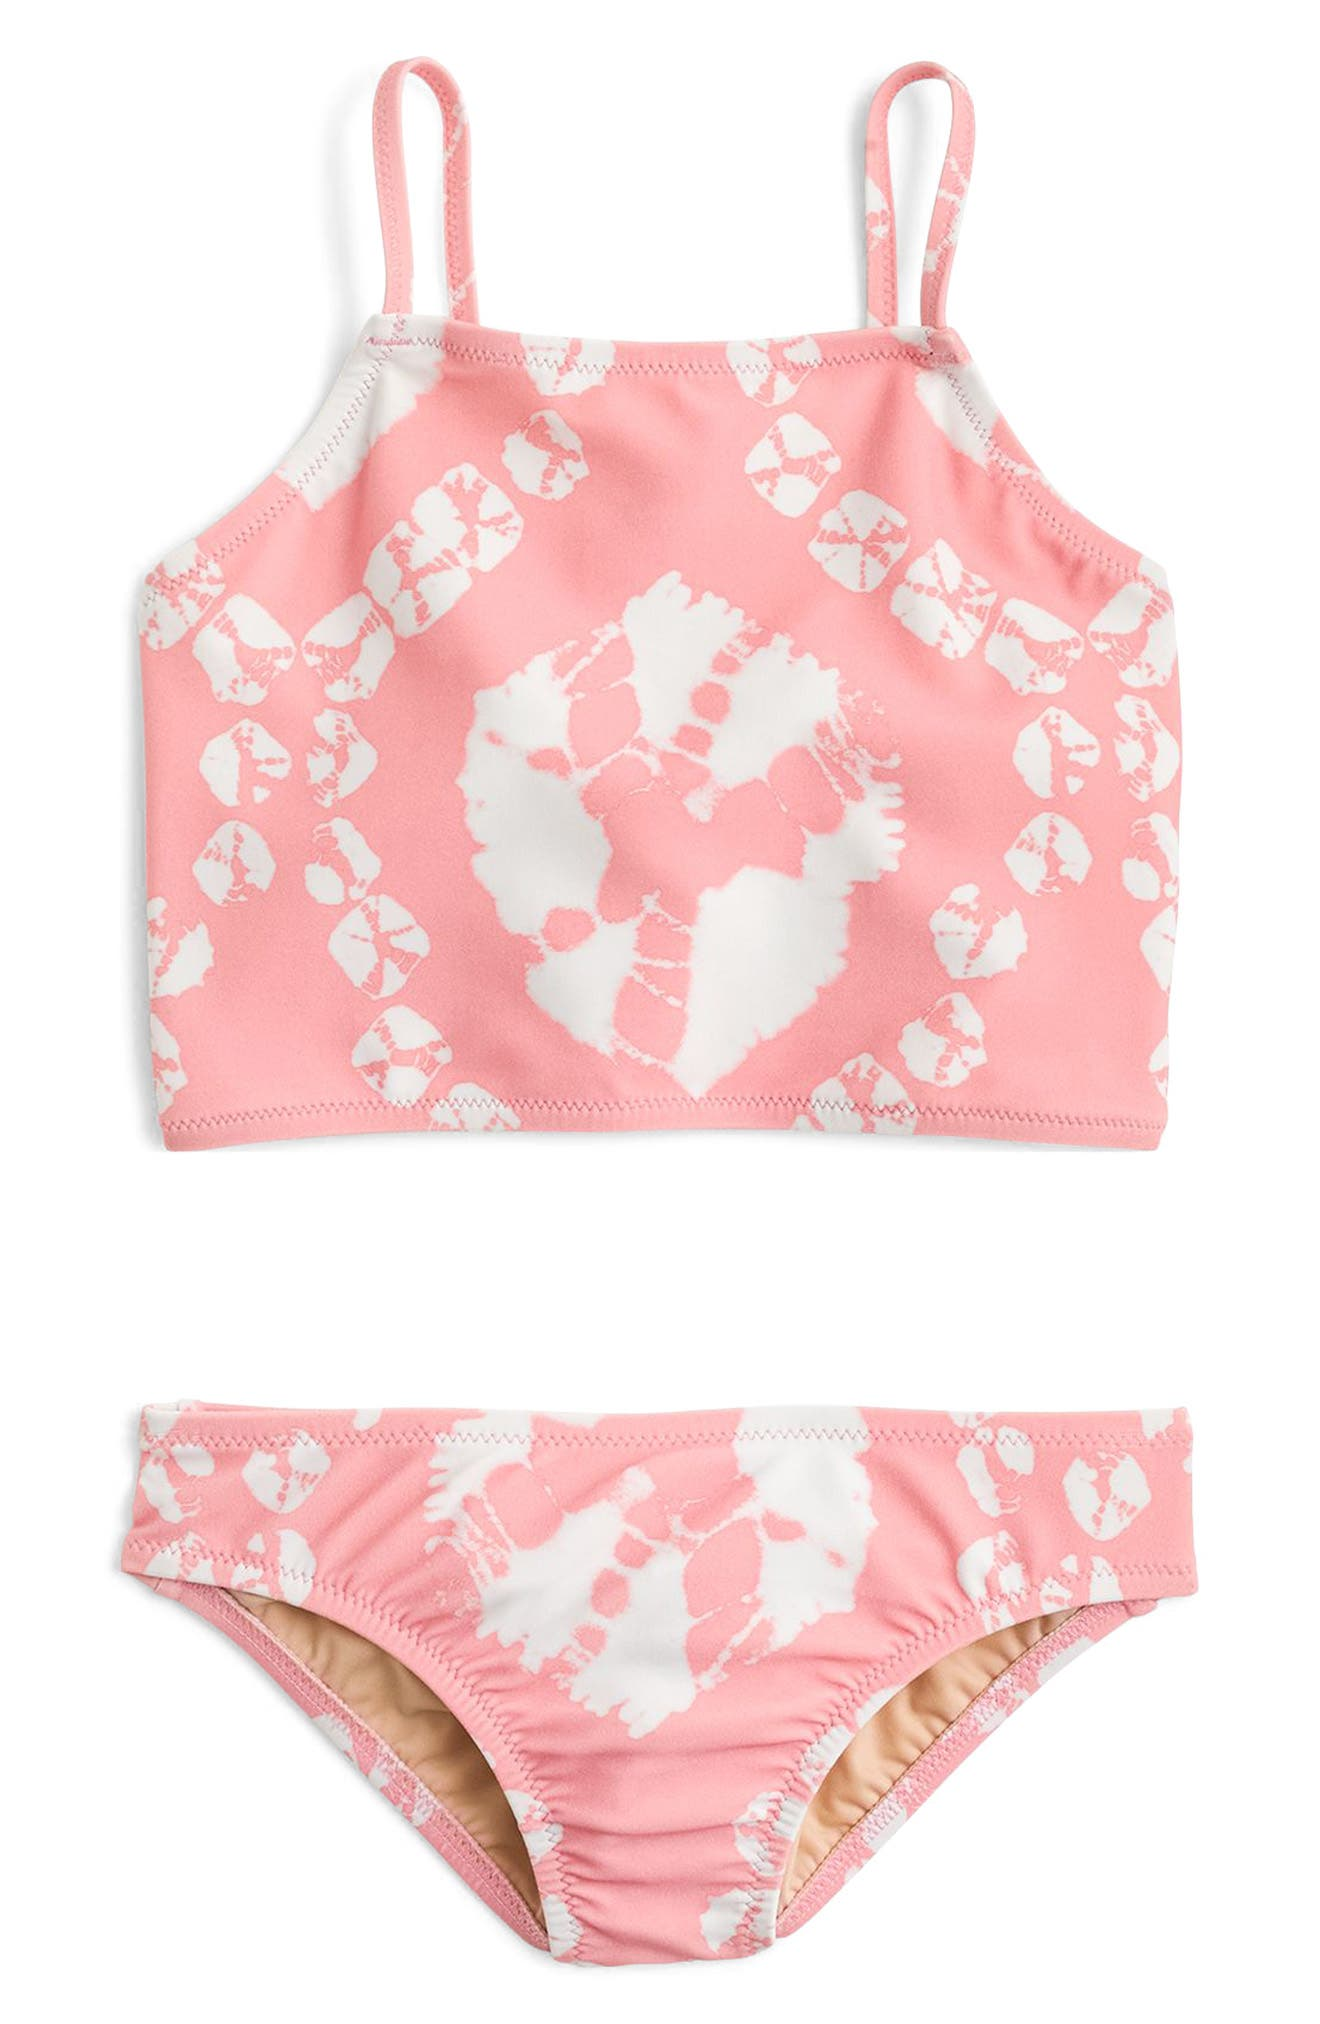 Tie Dye Two-Piece Swimsuit,                             Main thumbnail 1, color,                             652